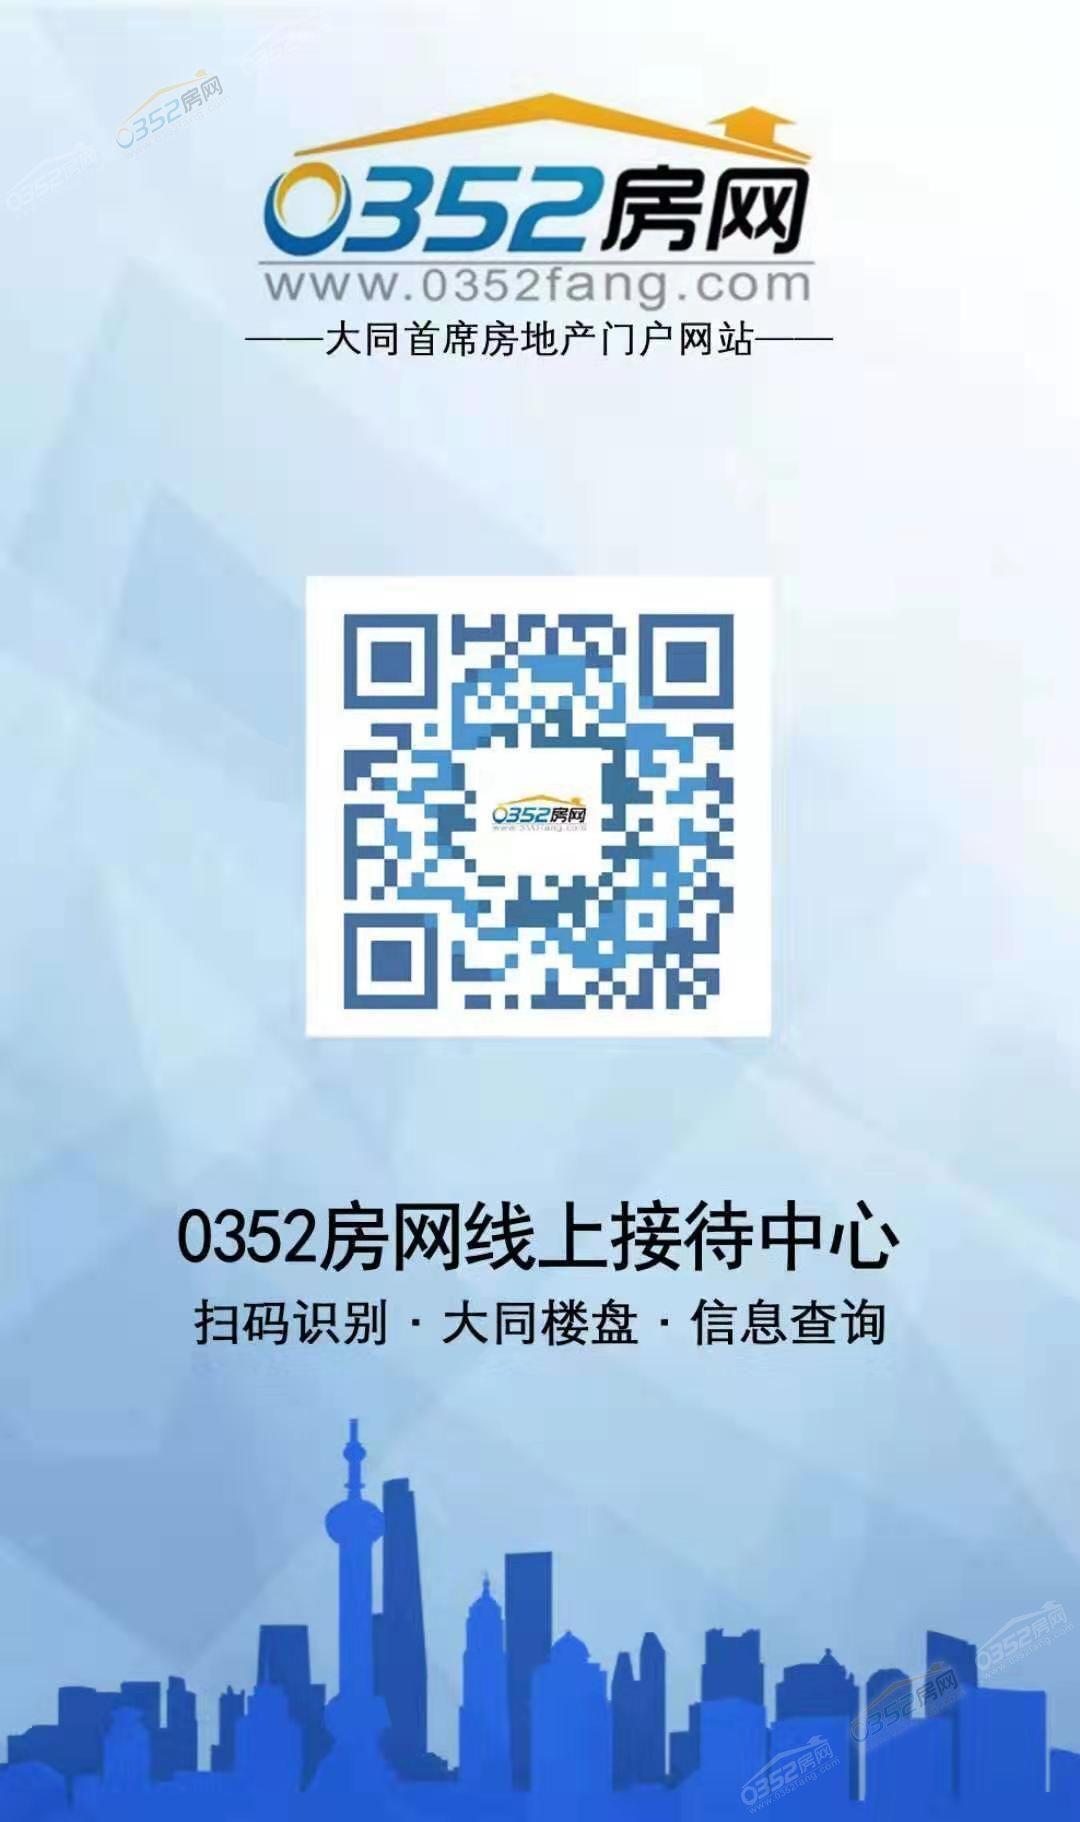 311648457f57477a807336.jpg